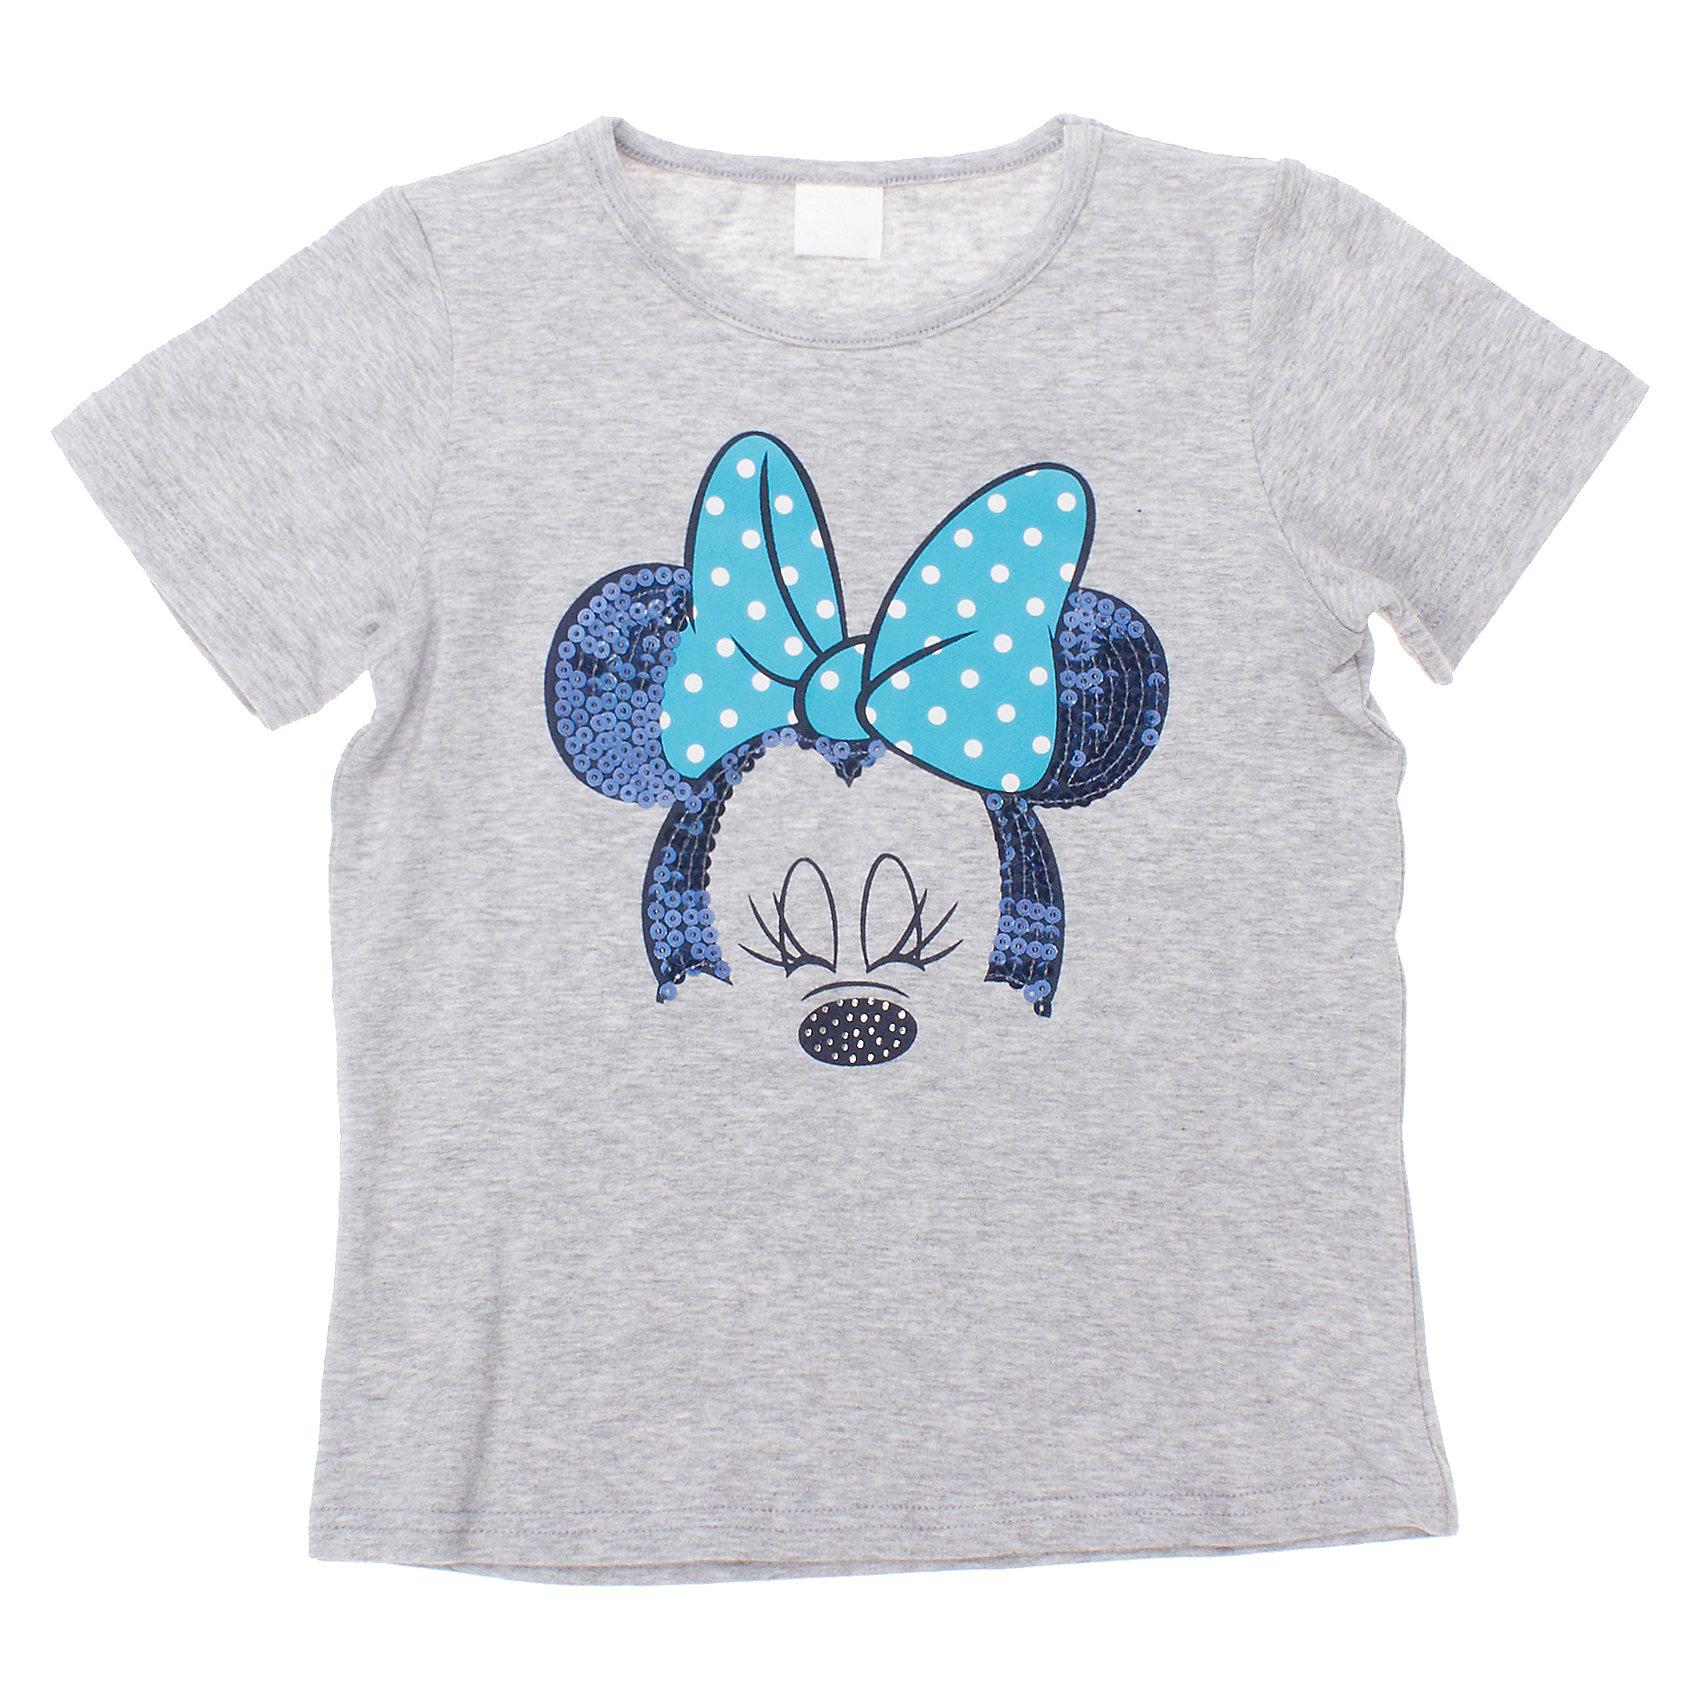 PlayToday Футболка для девочки PlayToday футболка playtoday футболка